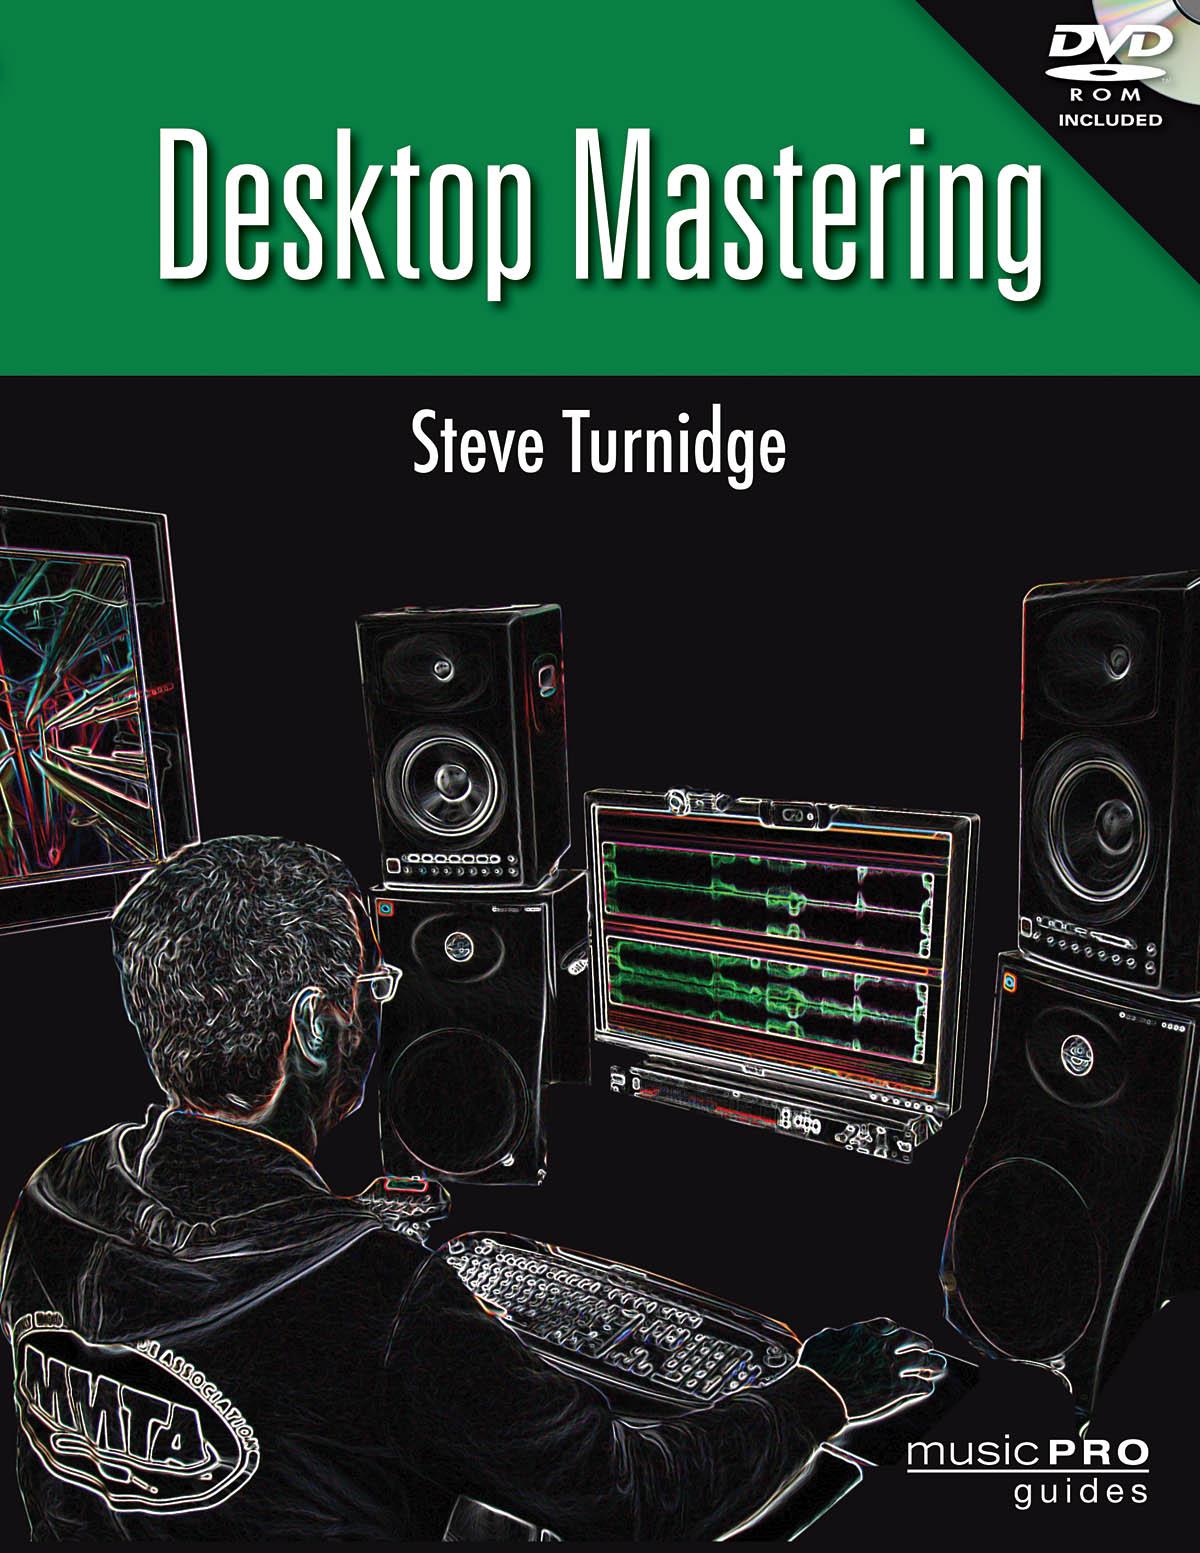 Desktop Mastering Pro Music Guide Books & DVD: Reference Books: Music Technology